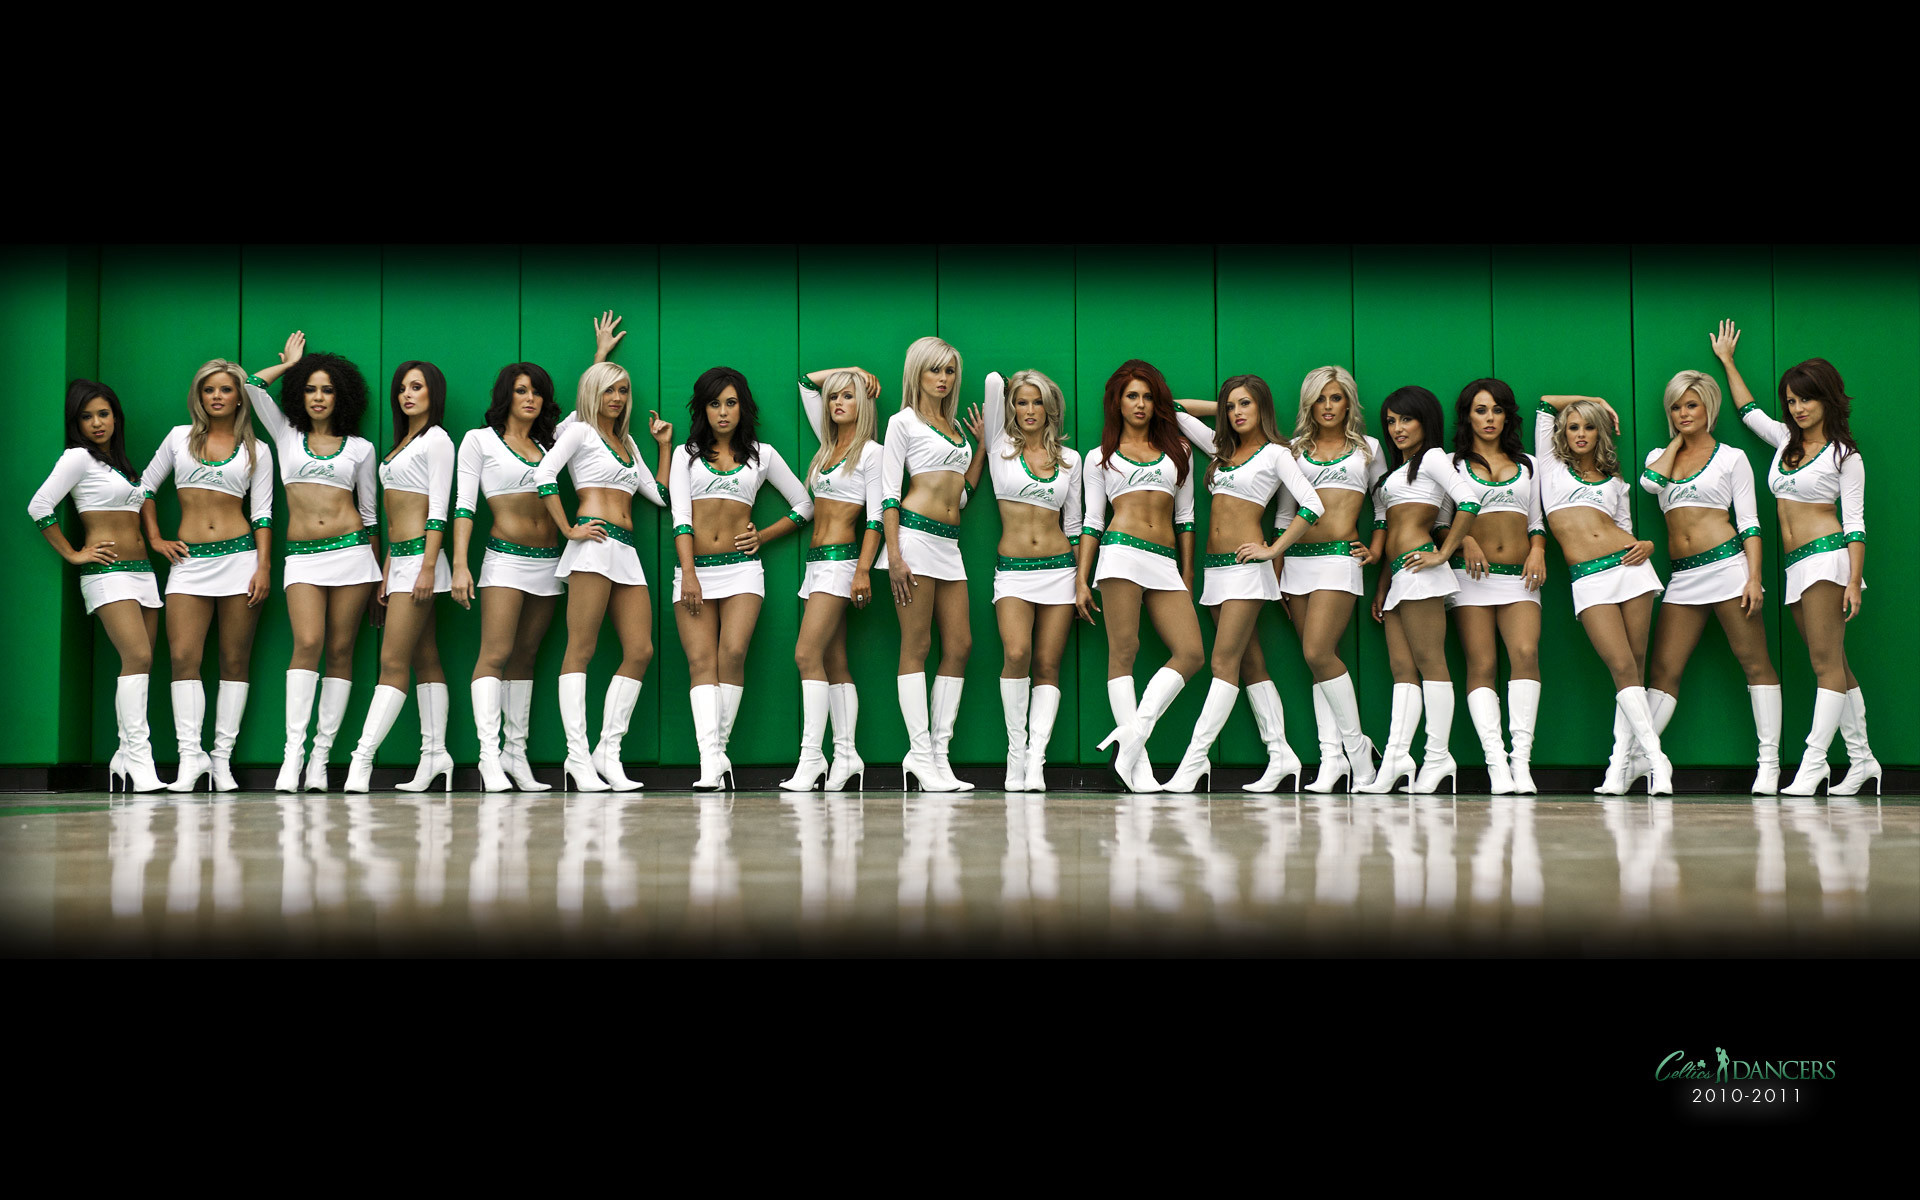 Boston, Celtics, Cheerleaders, Hd, Wallpaper